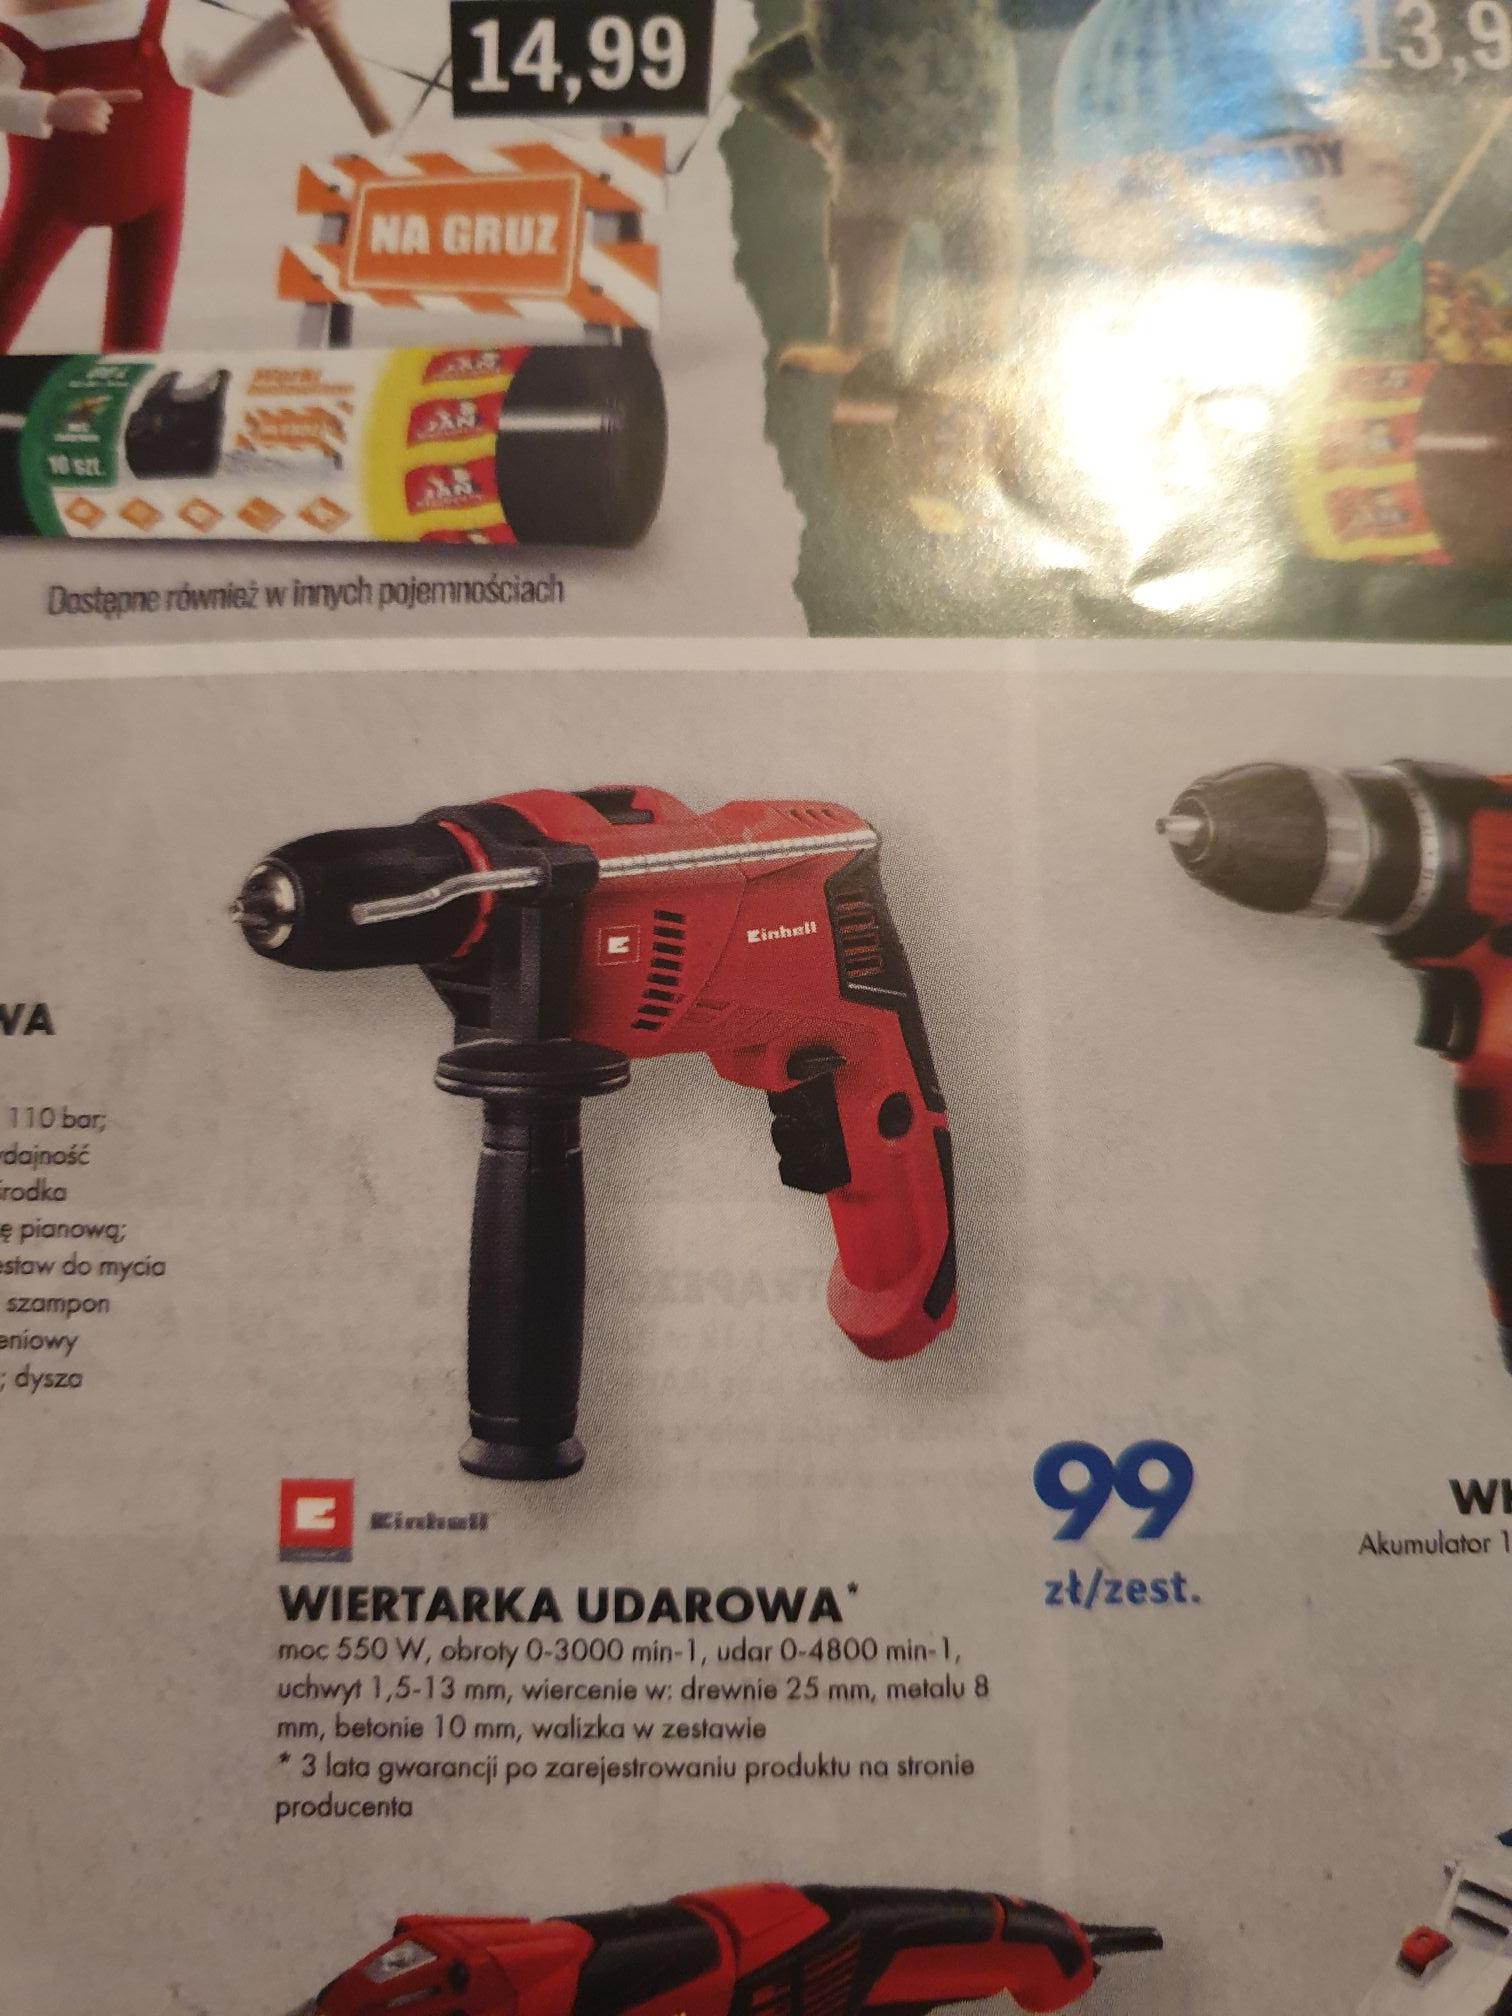 Wiertarka Einhell TE-ID 500 E